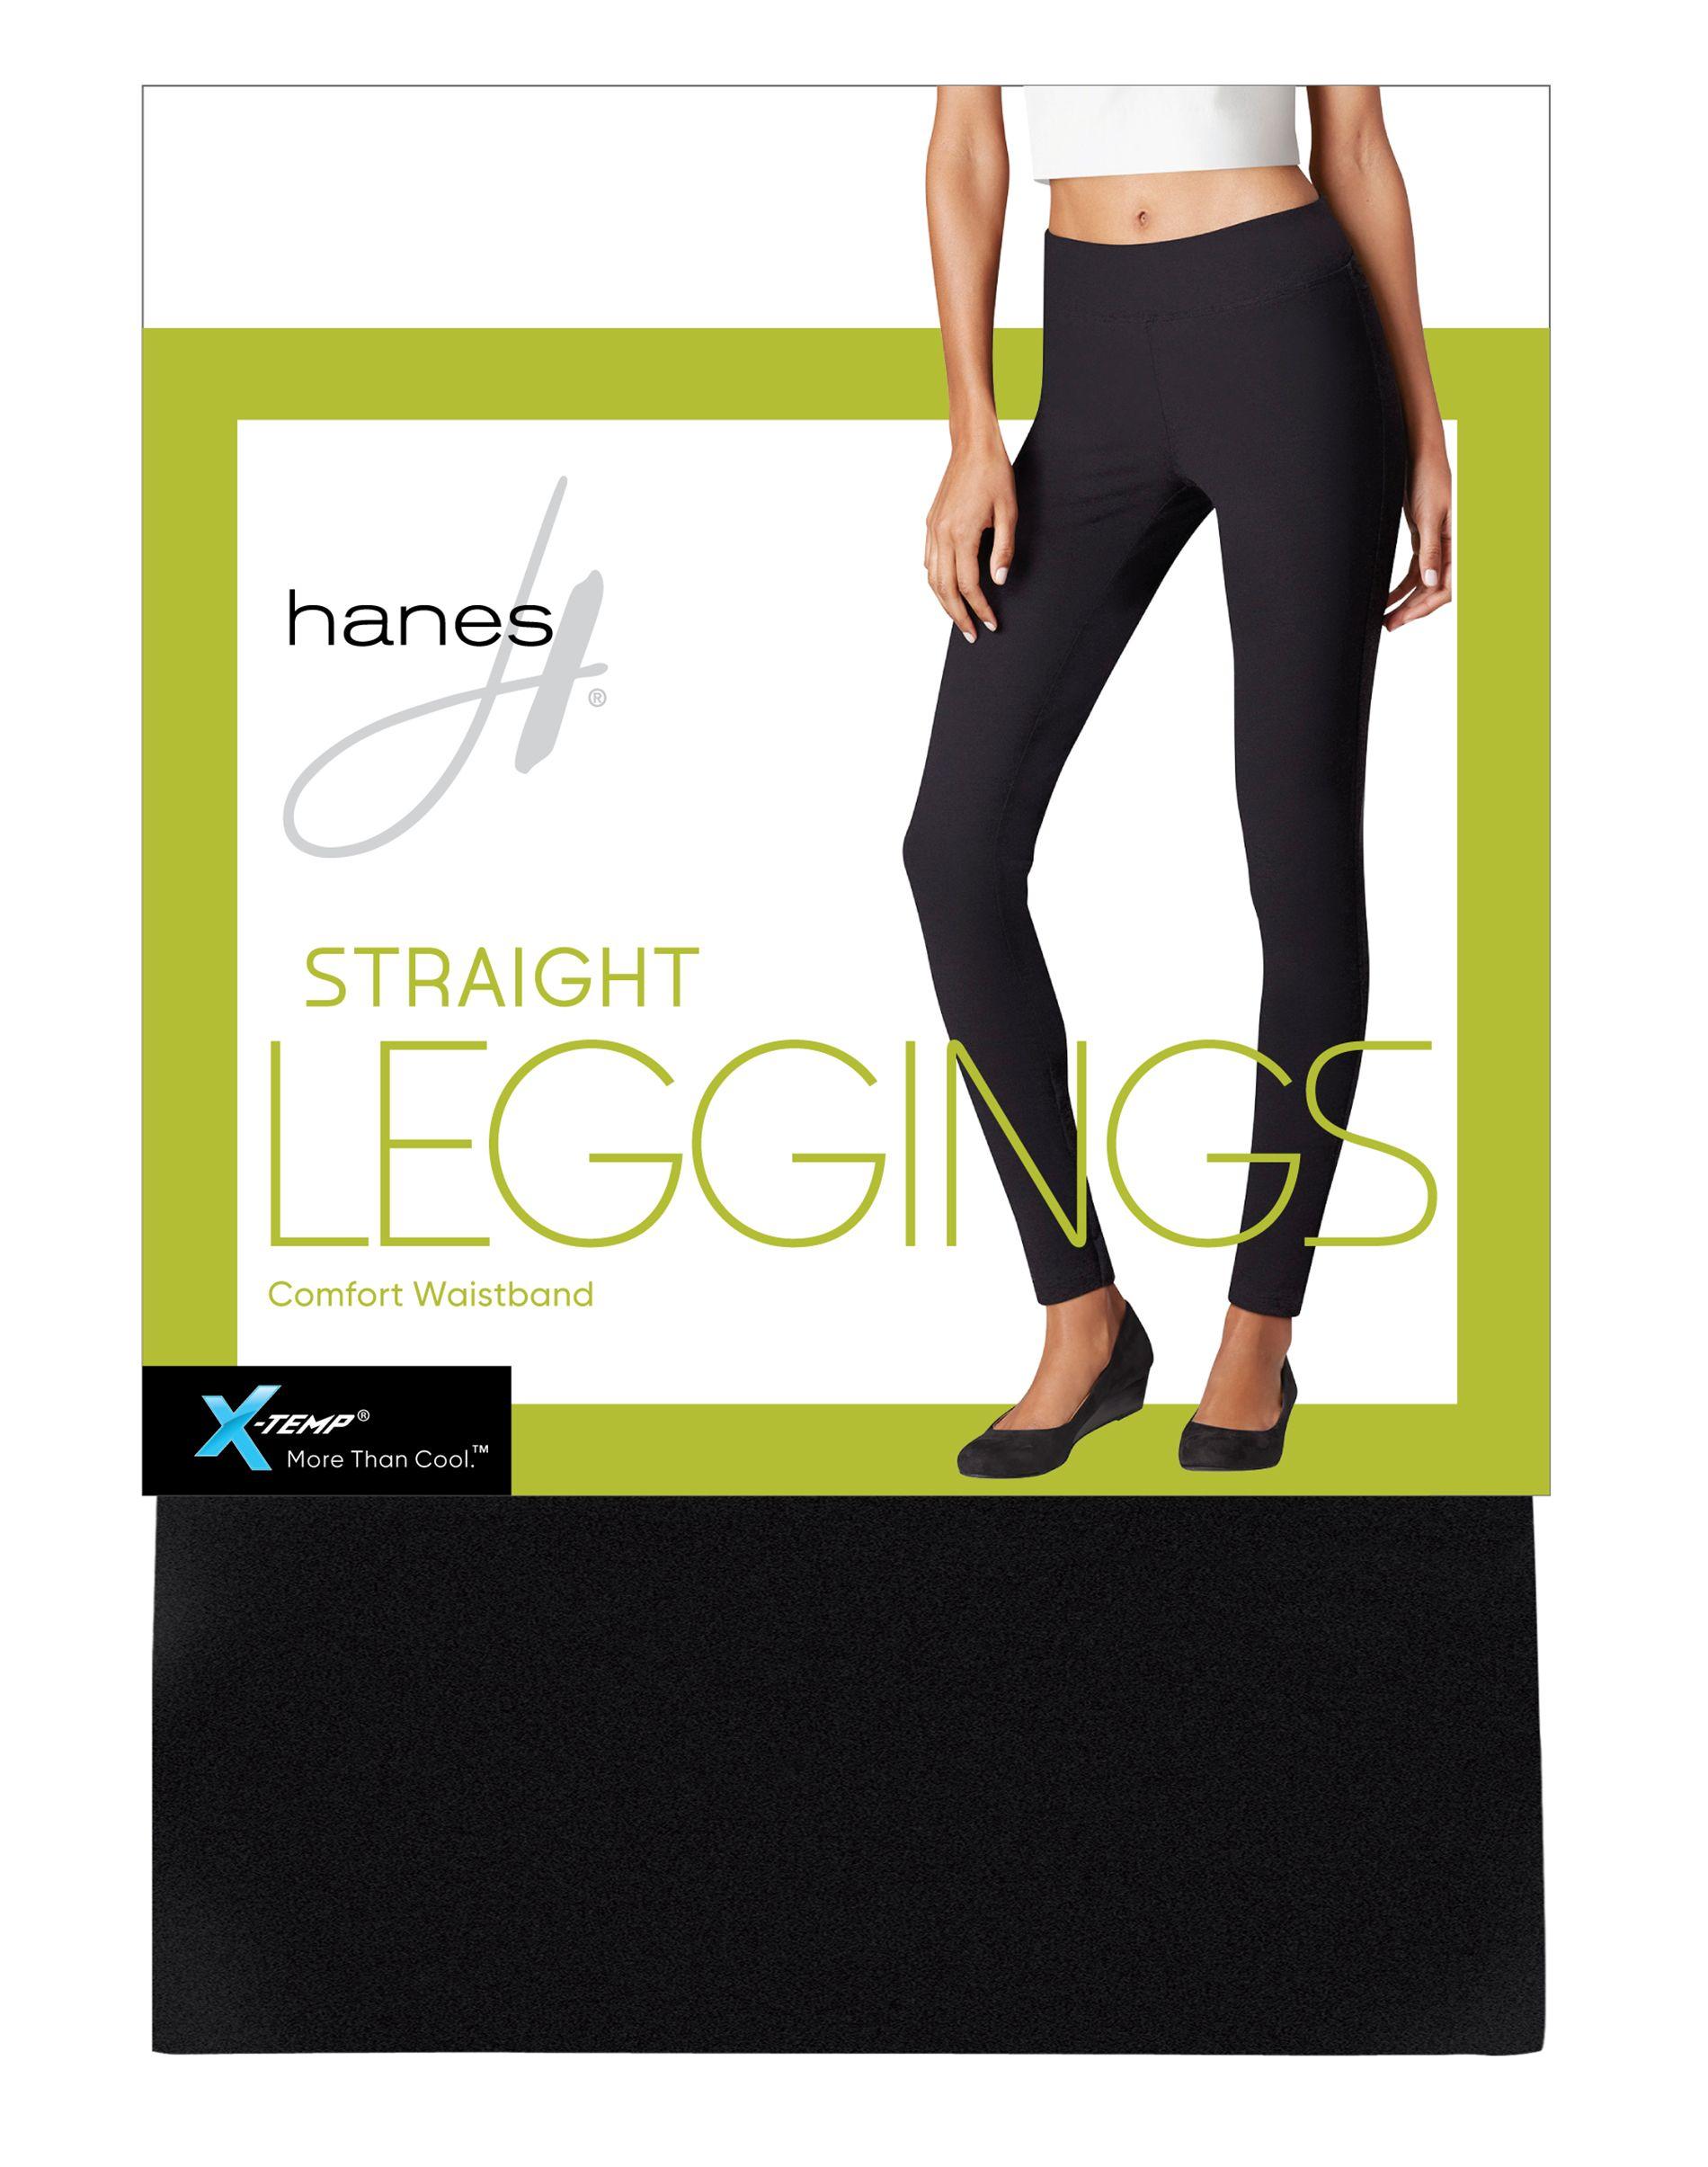 hanes straight leggings women Hanes